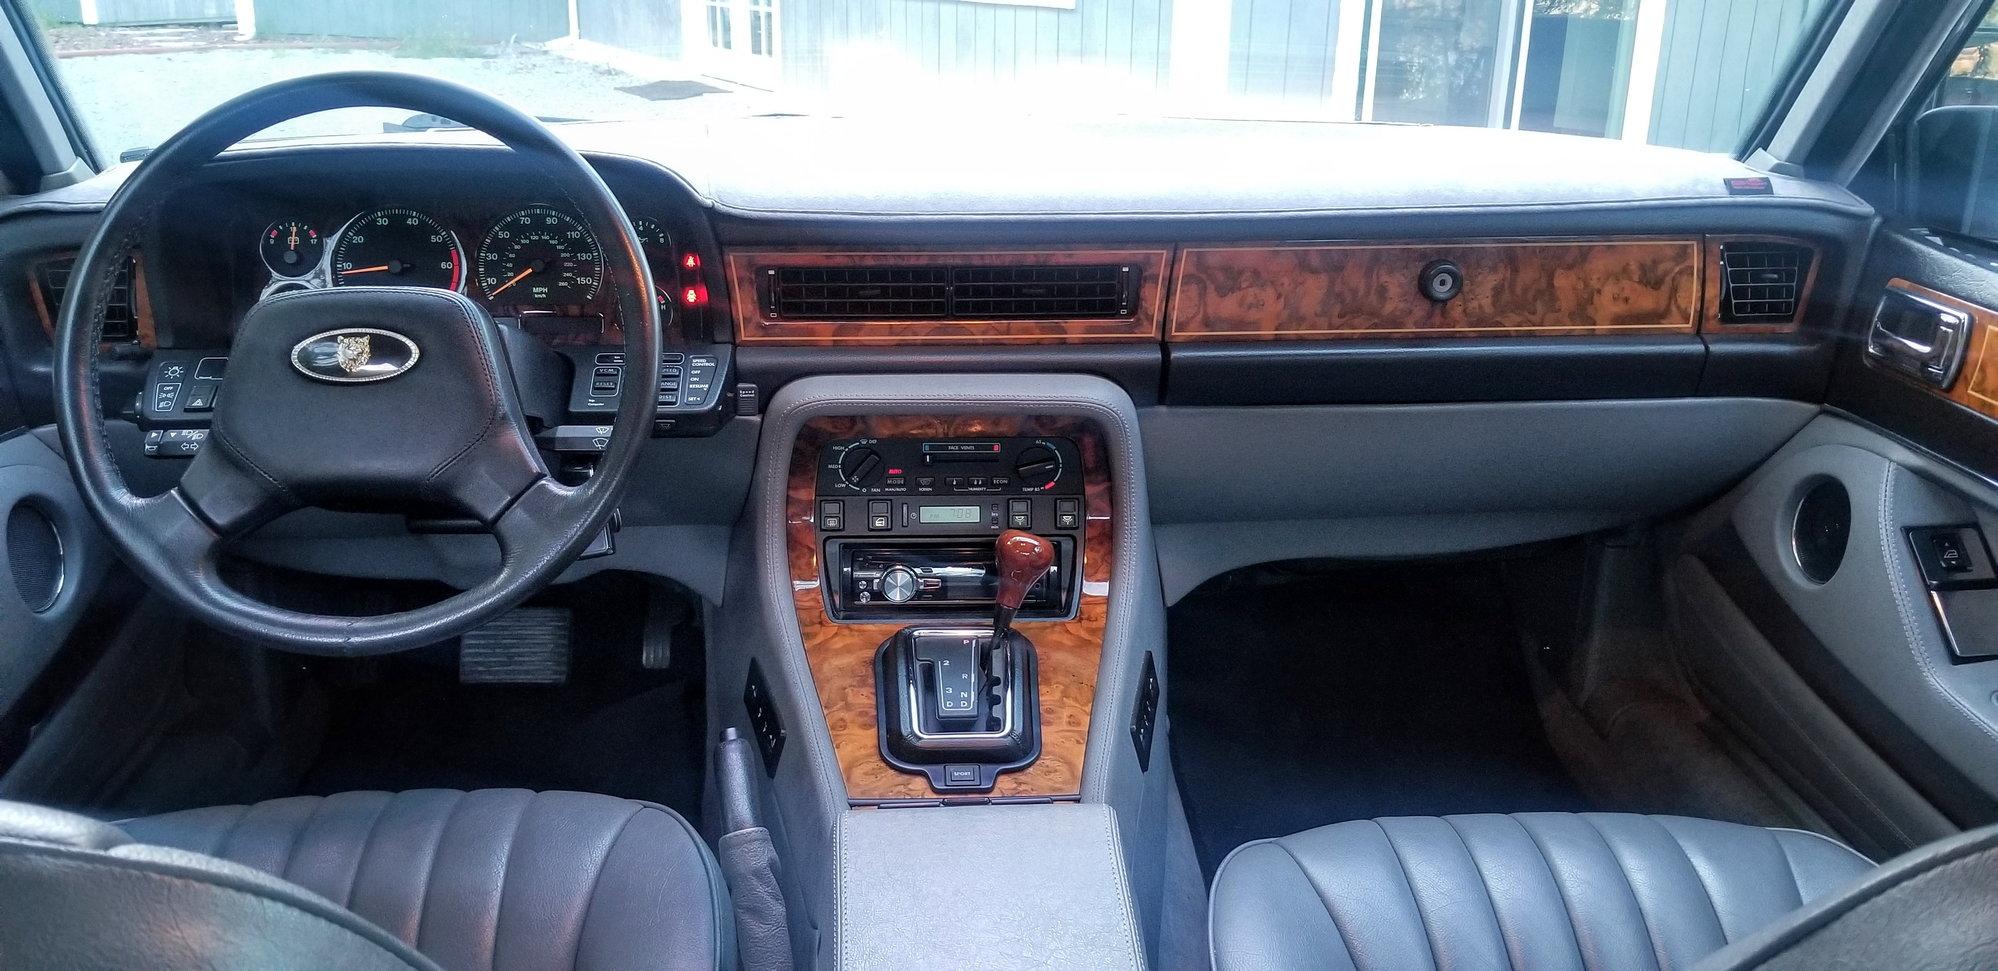 1990 Jaguar XJ6 / XJ40 Sovereign :: 45k miles - Jaguar ...